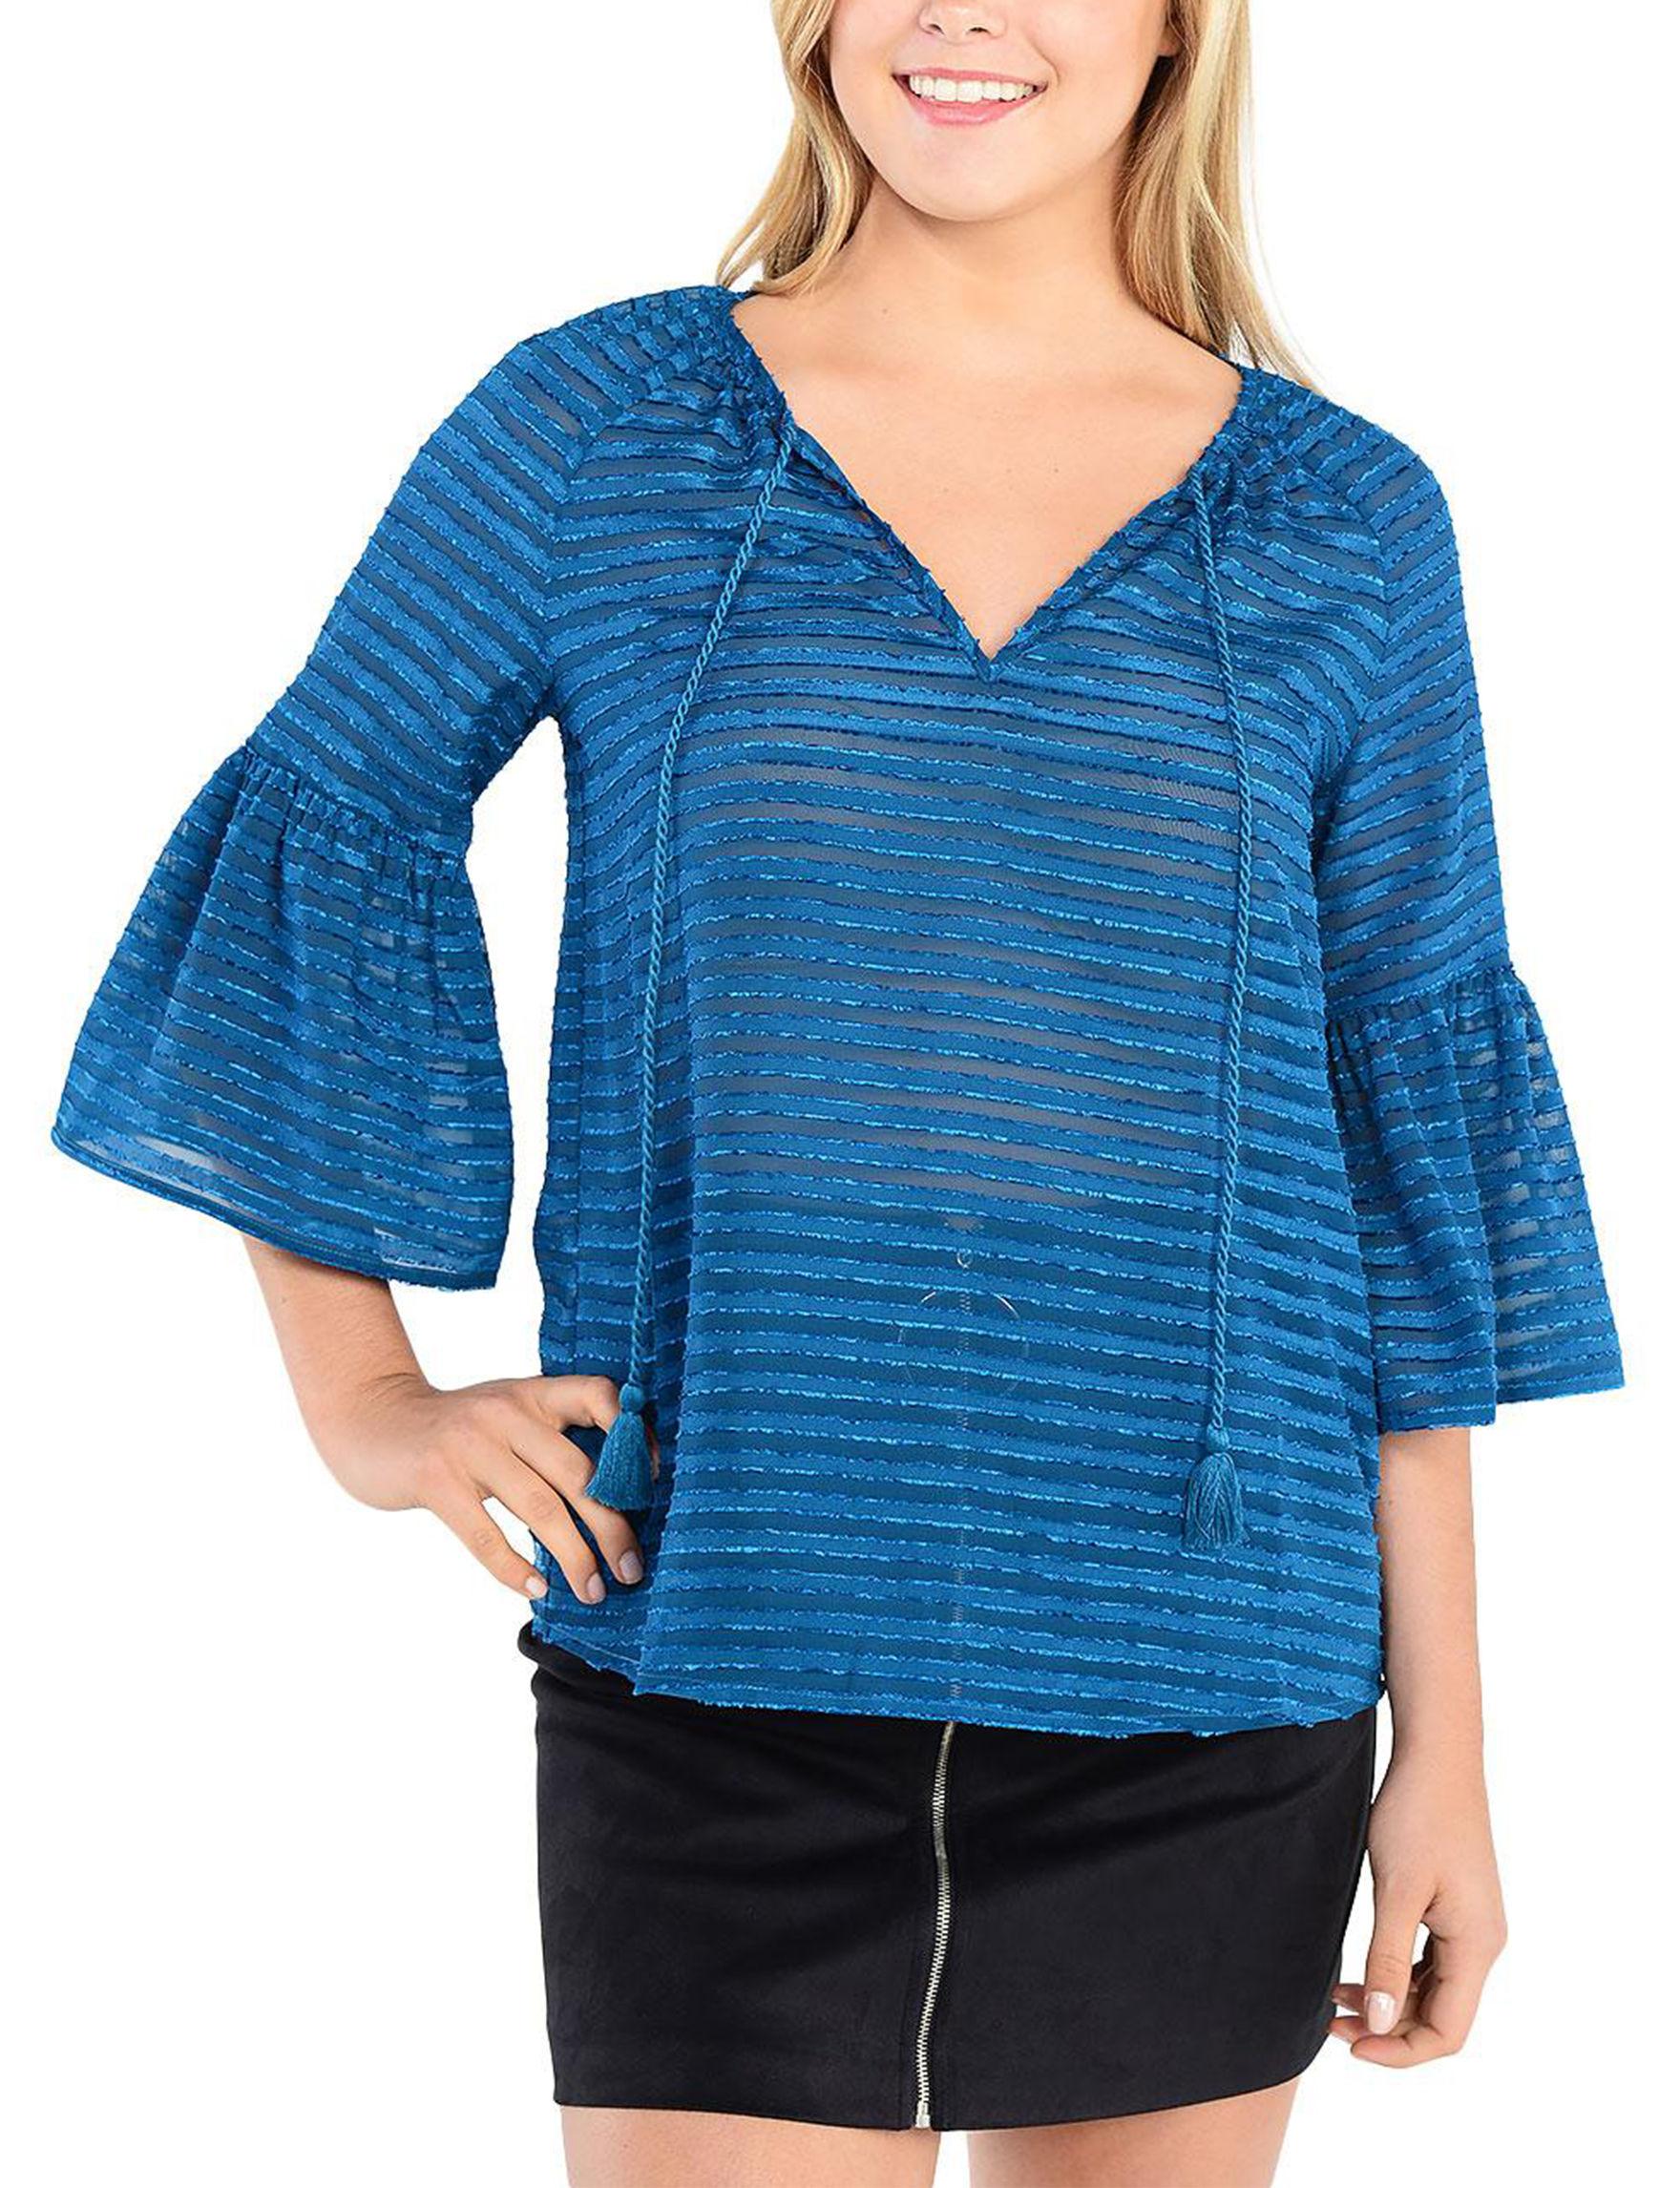 Kensie Blue Shirts & Blouses